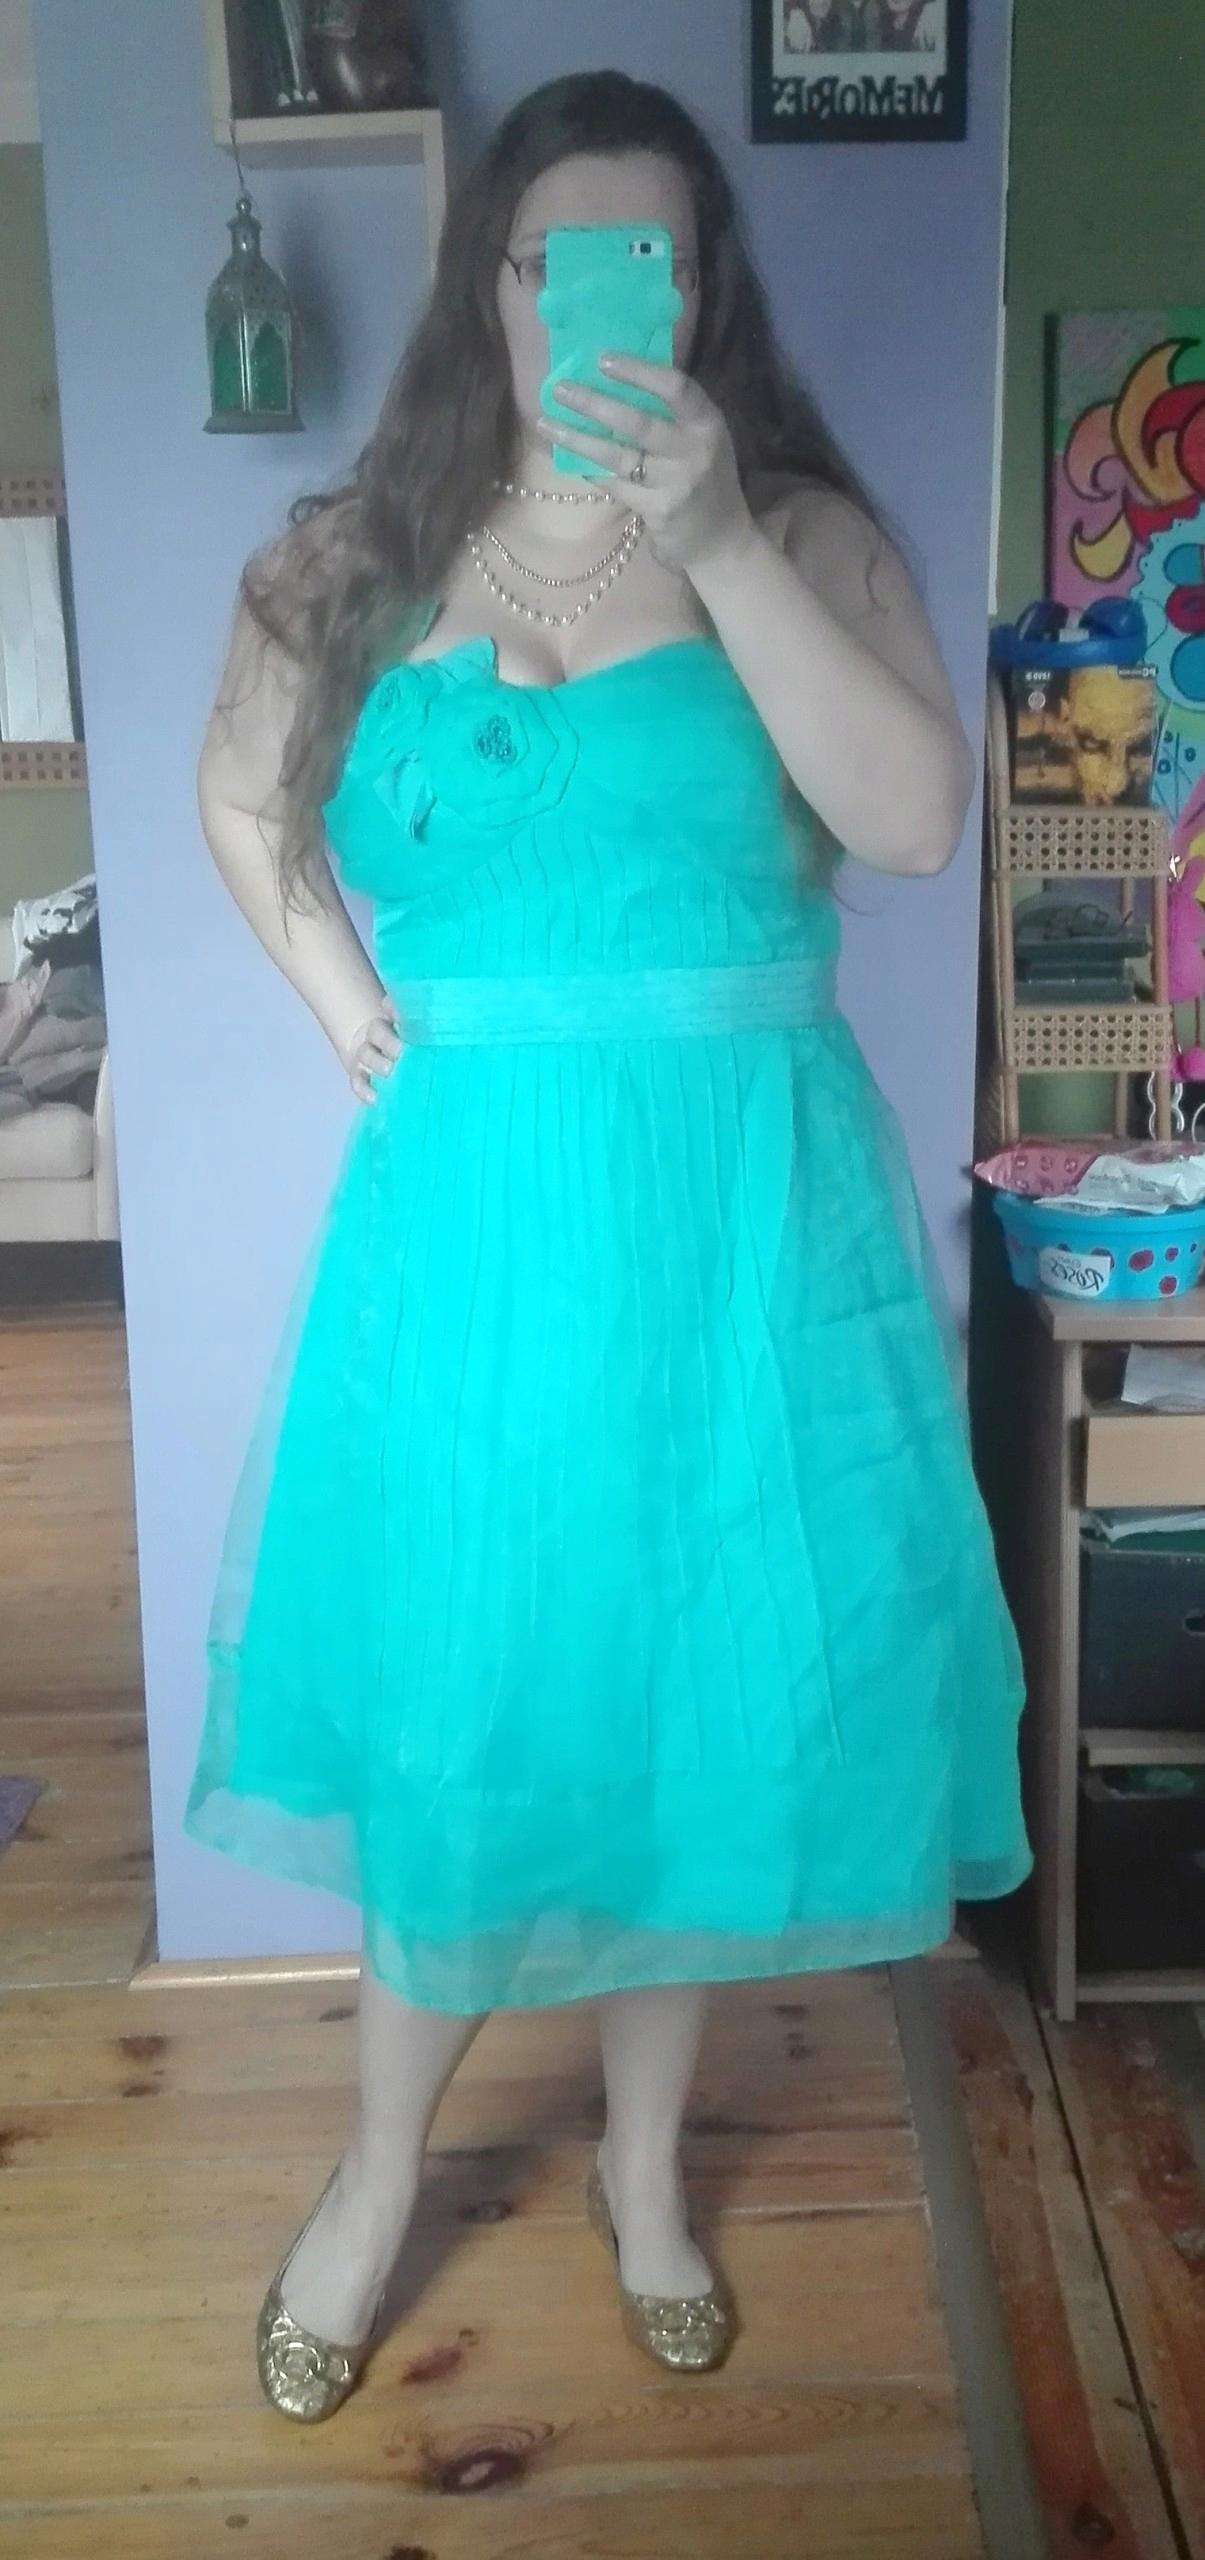 c1dde35c92 Piękna rozkloszowana sukienka balowa turkus 48 - 7468993144 ...